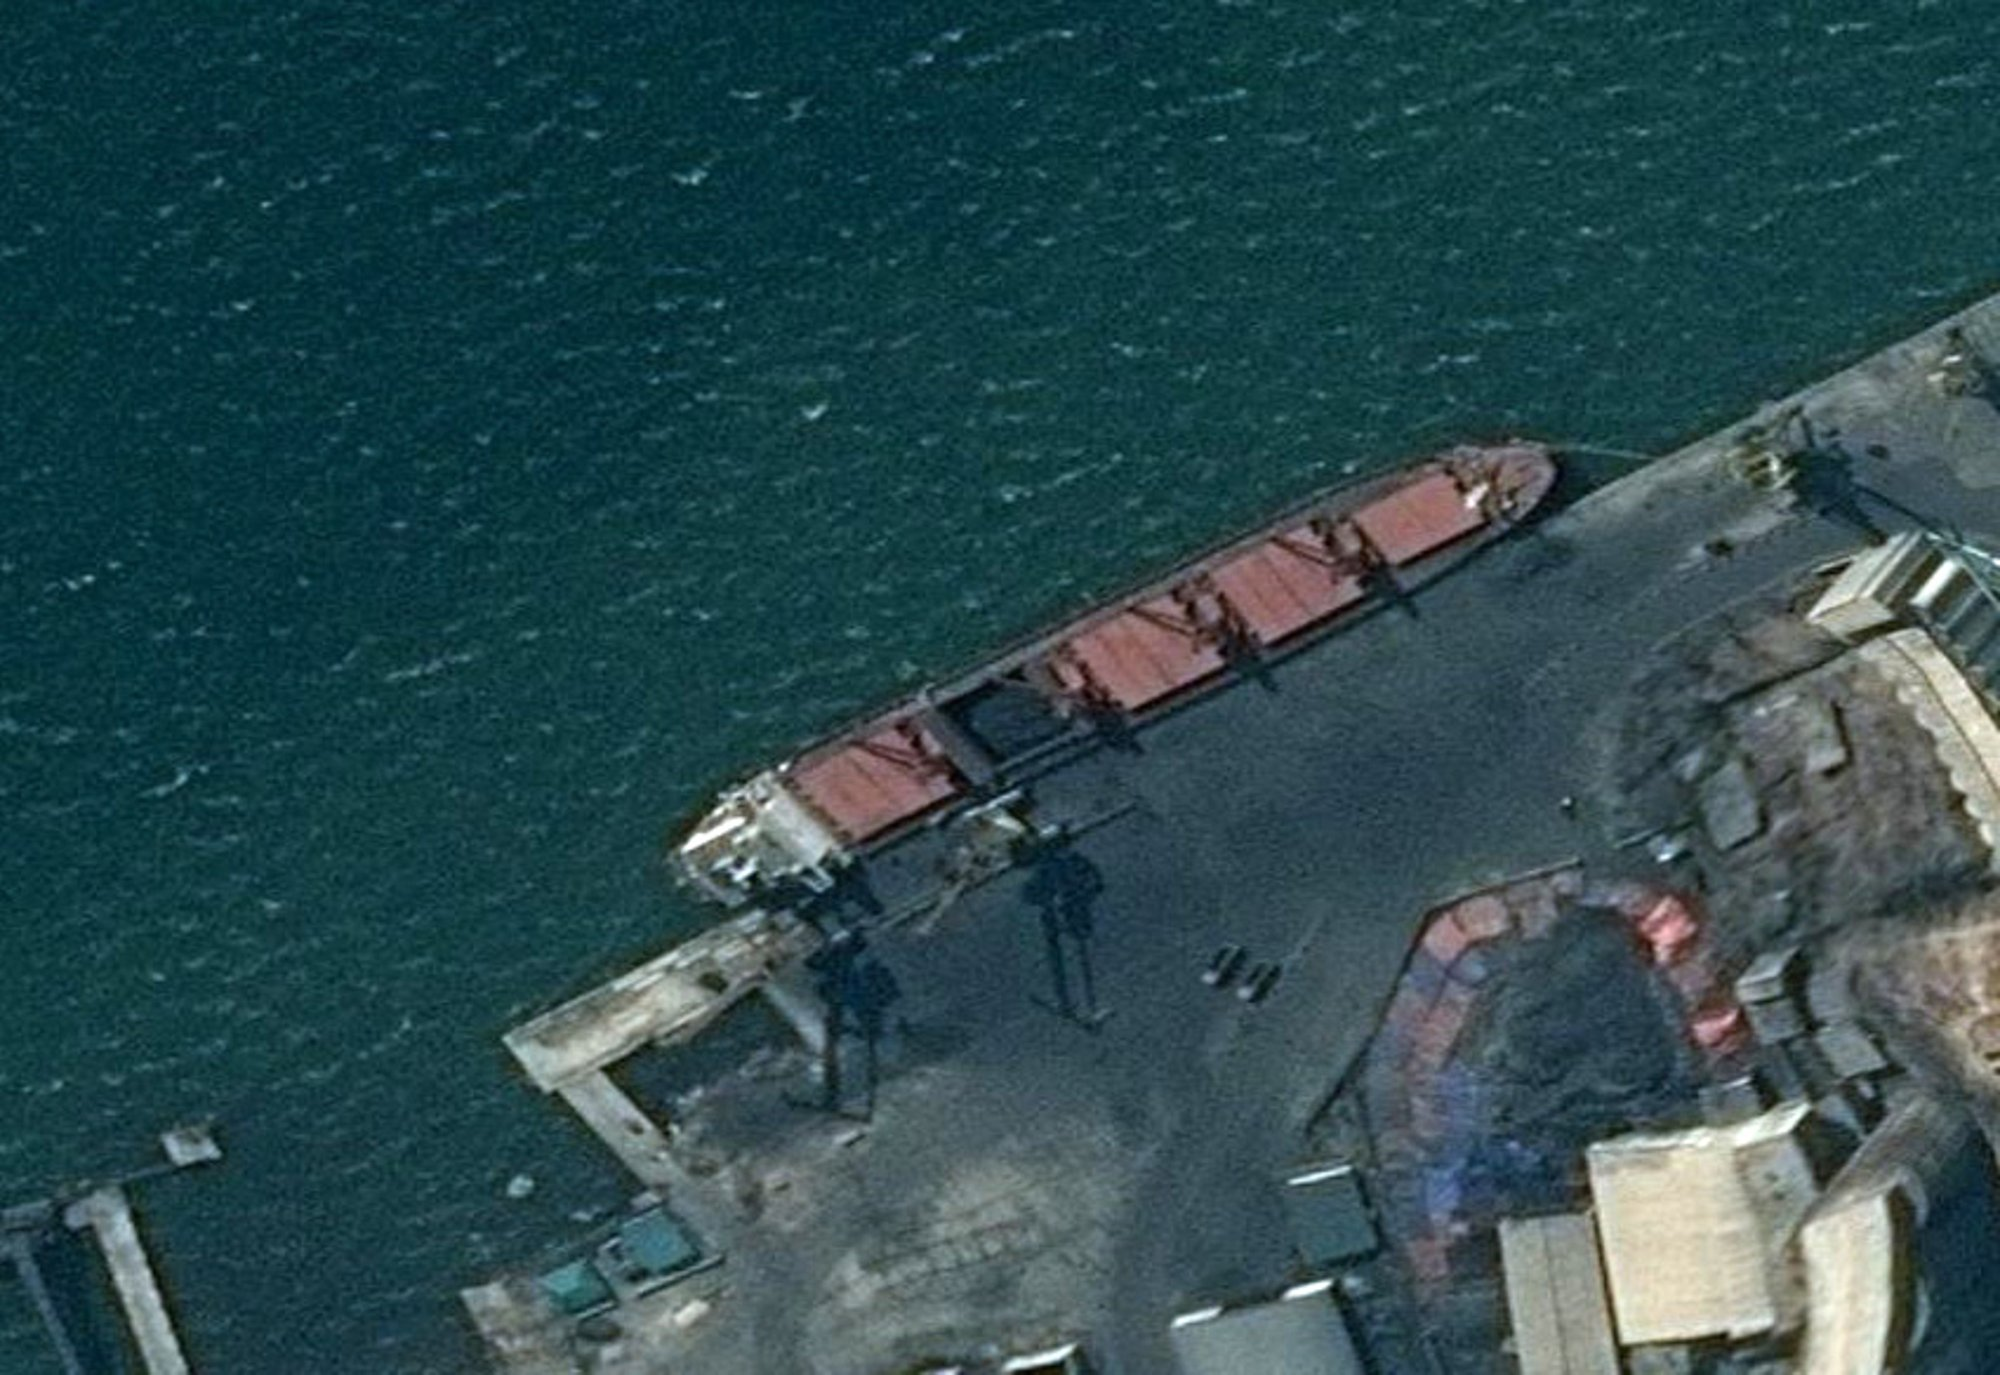 AP Explains: What's behind rare US seizure of N. Korea ship